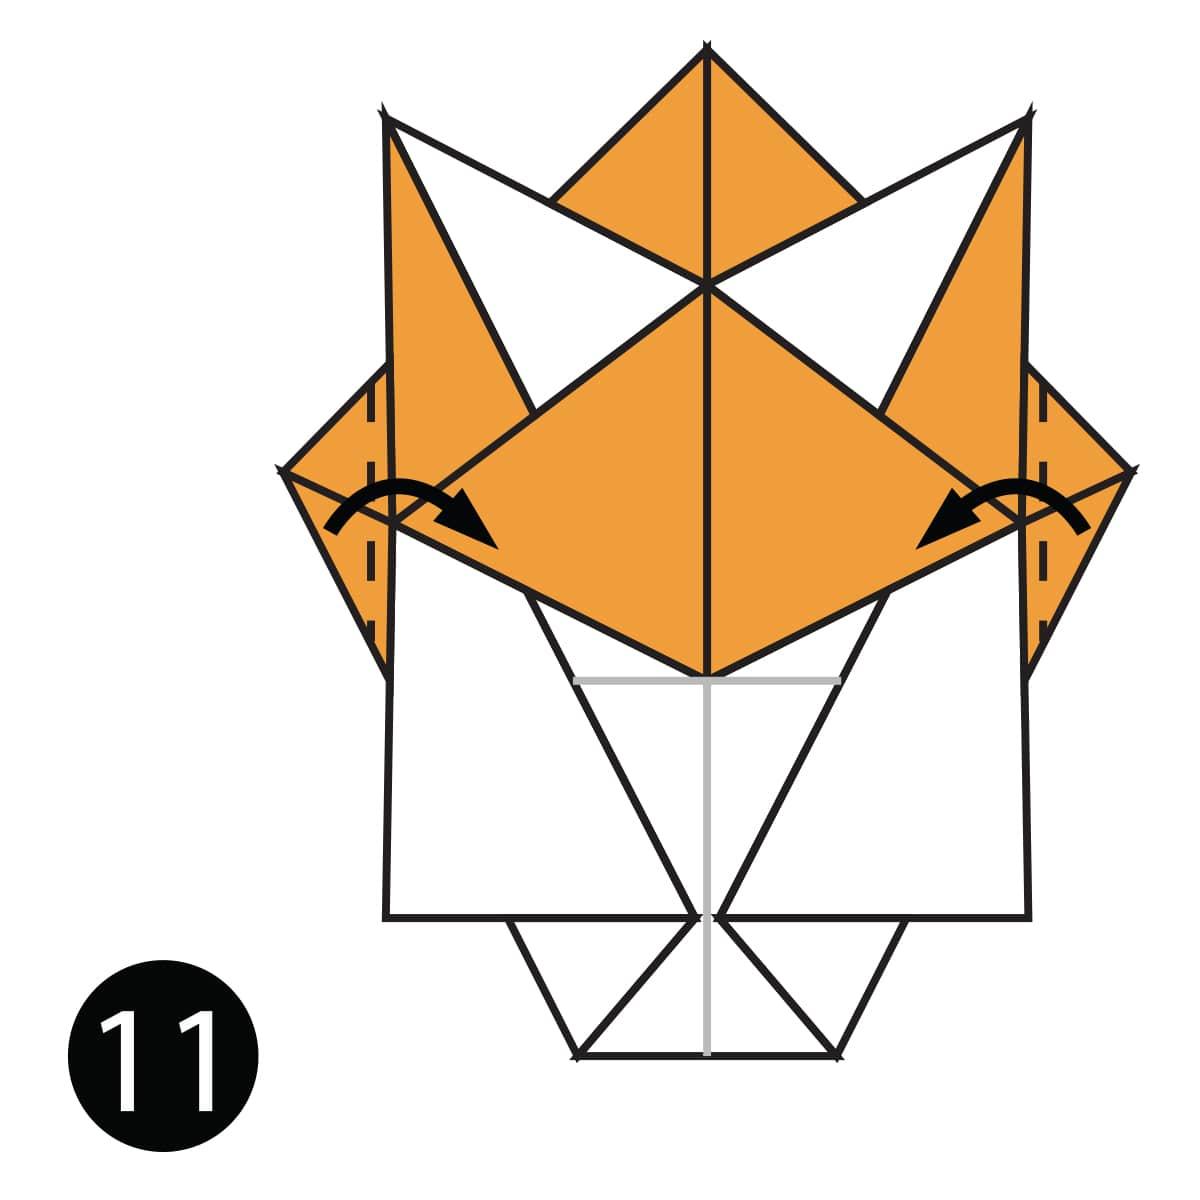 Platypus Step 11